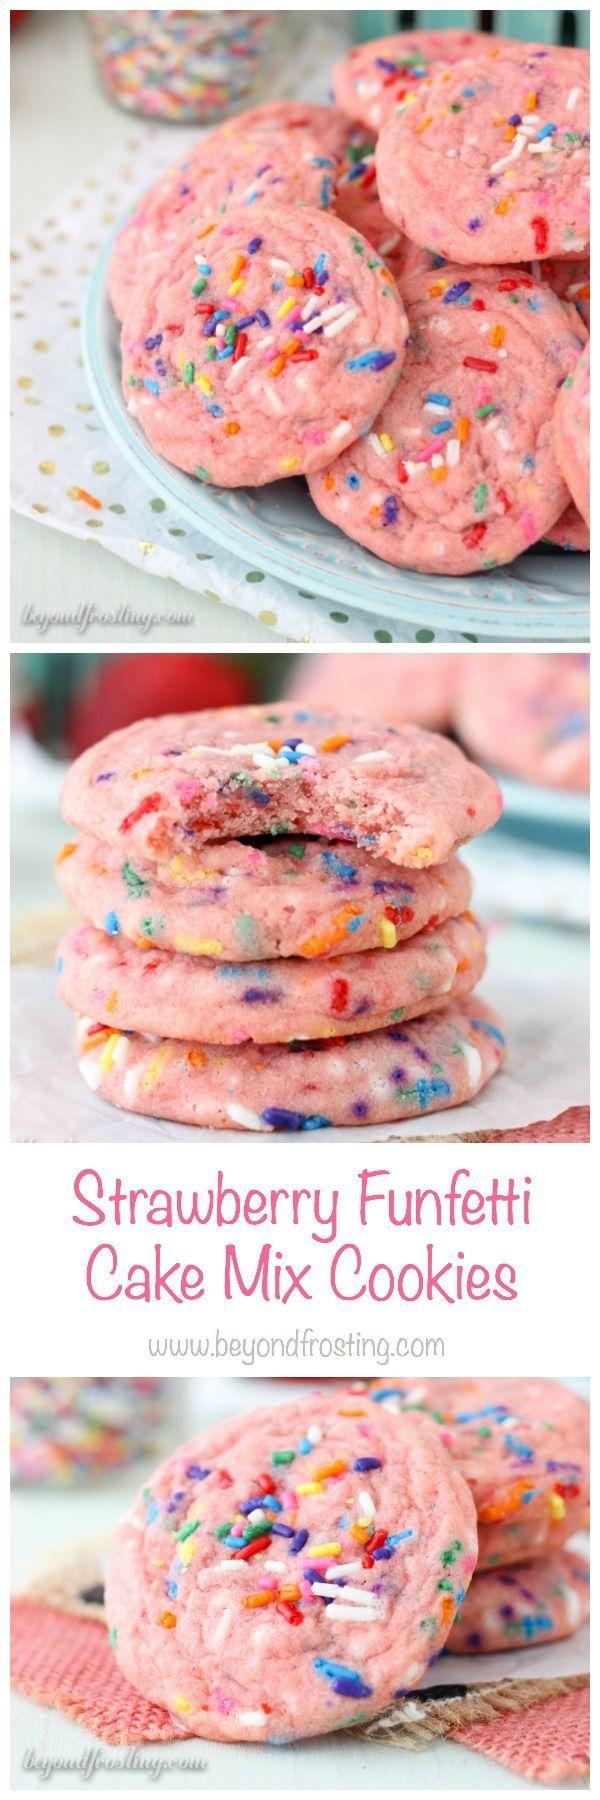 Add Strawberry Preserves Cake Mix